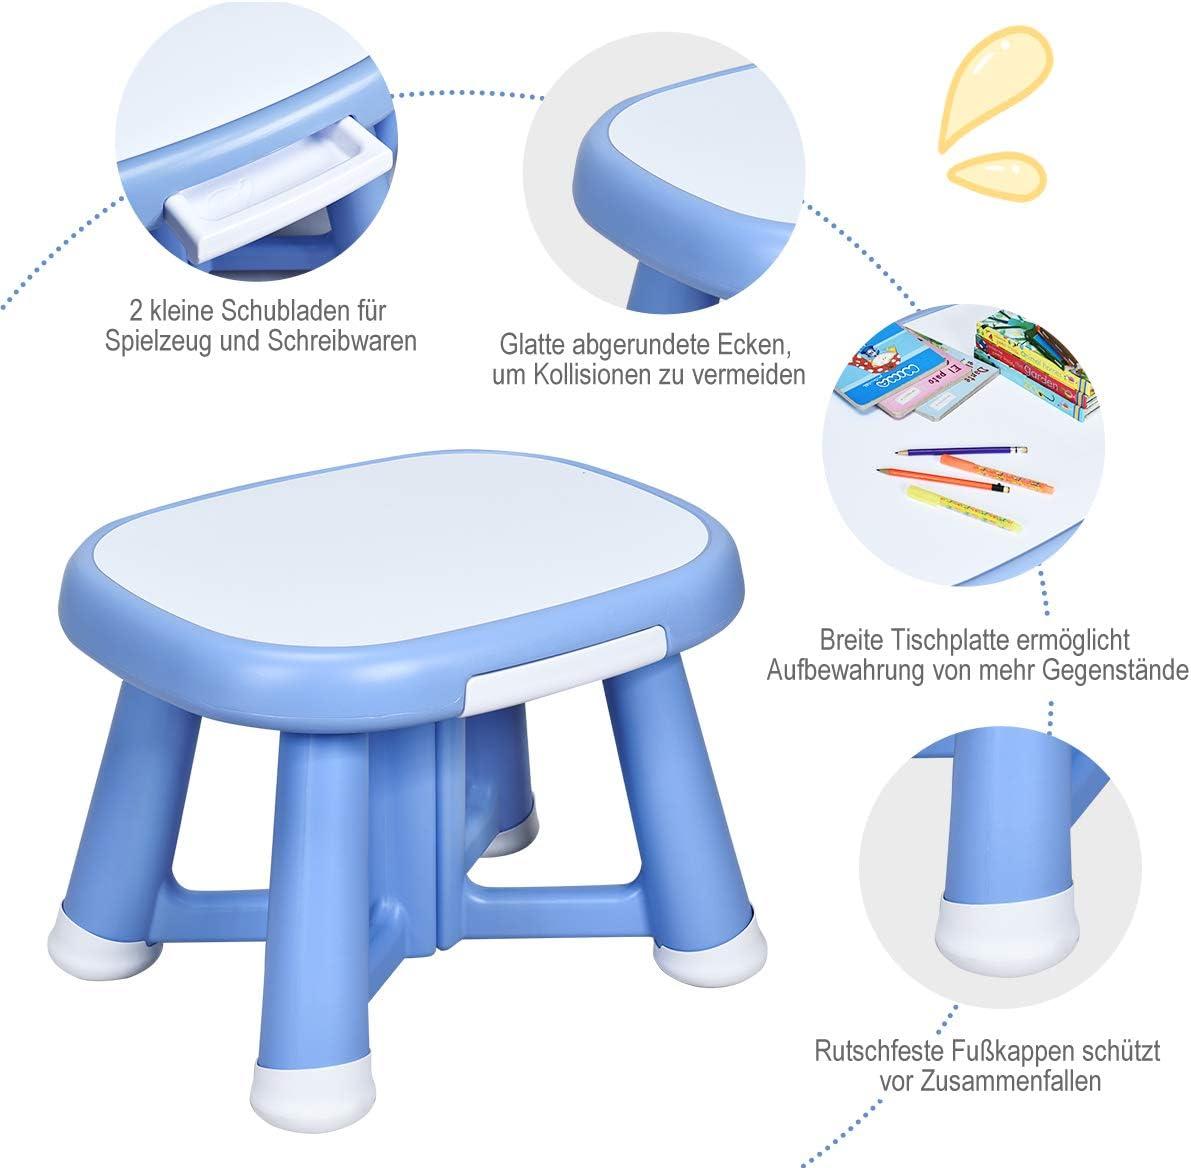 Blau New Classic Toys 10681 Apron-Blue